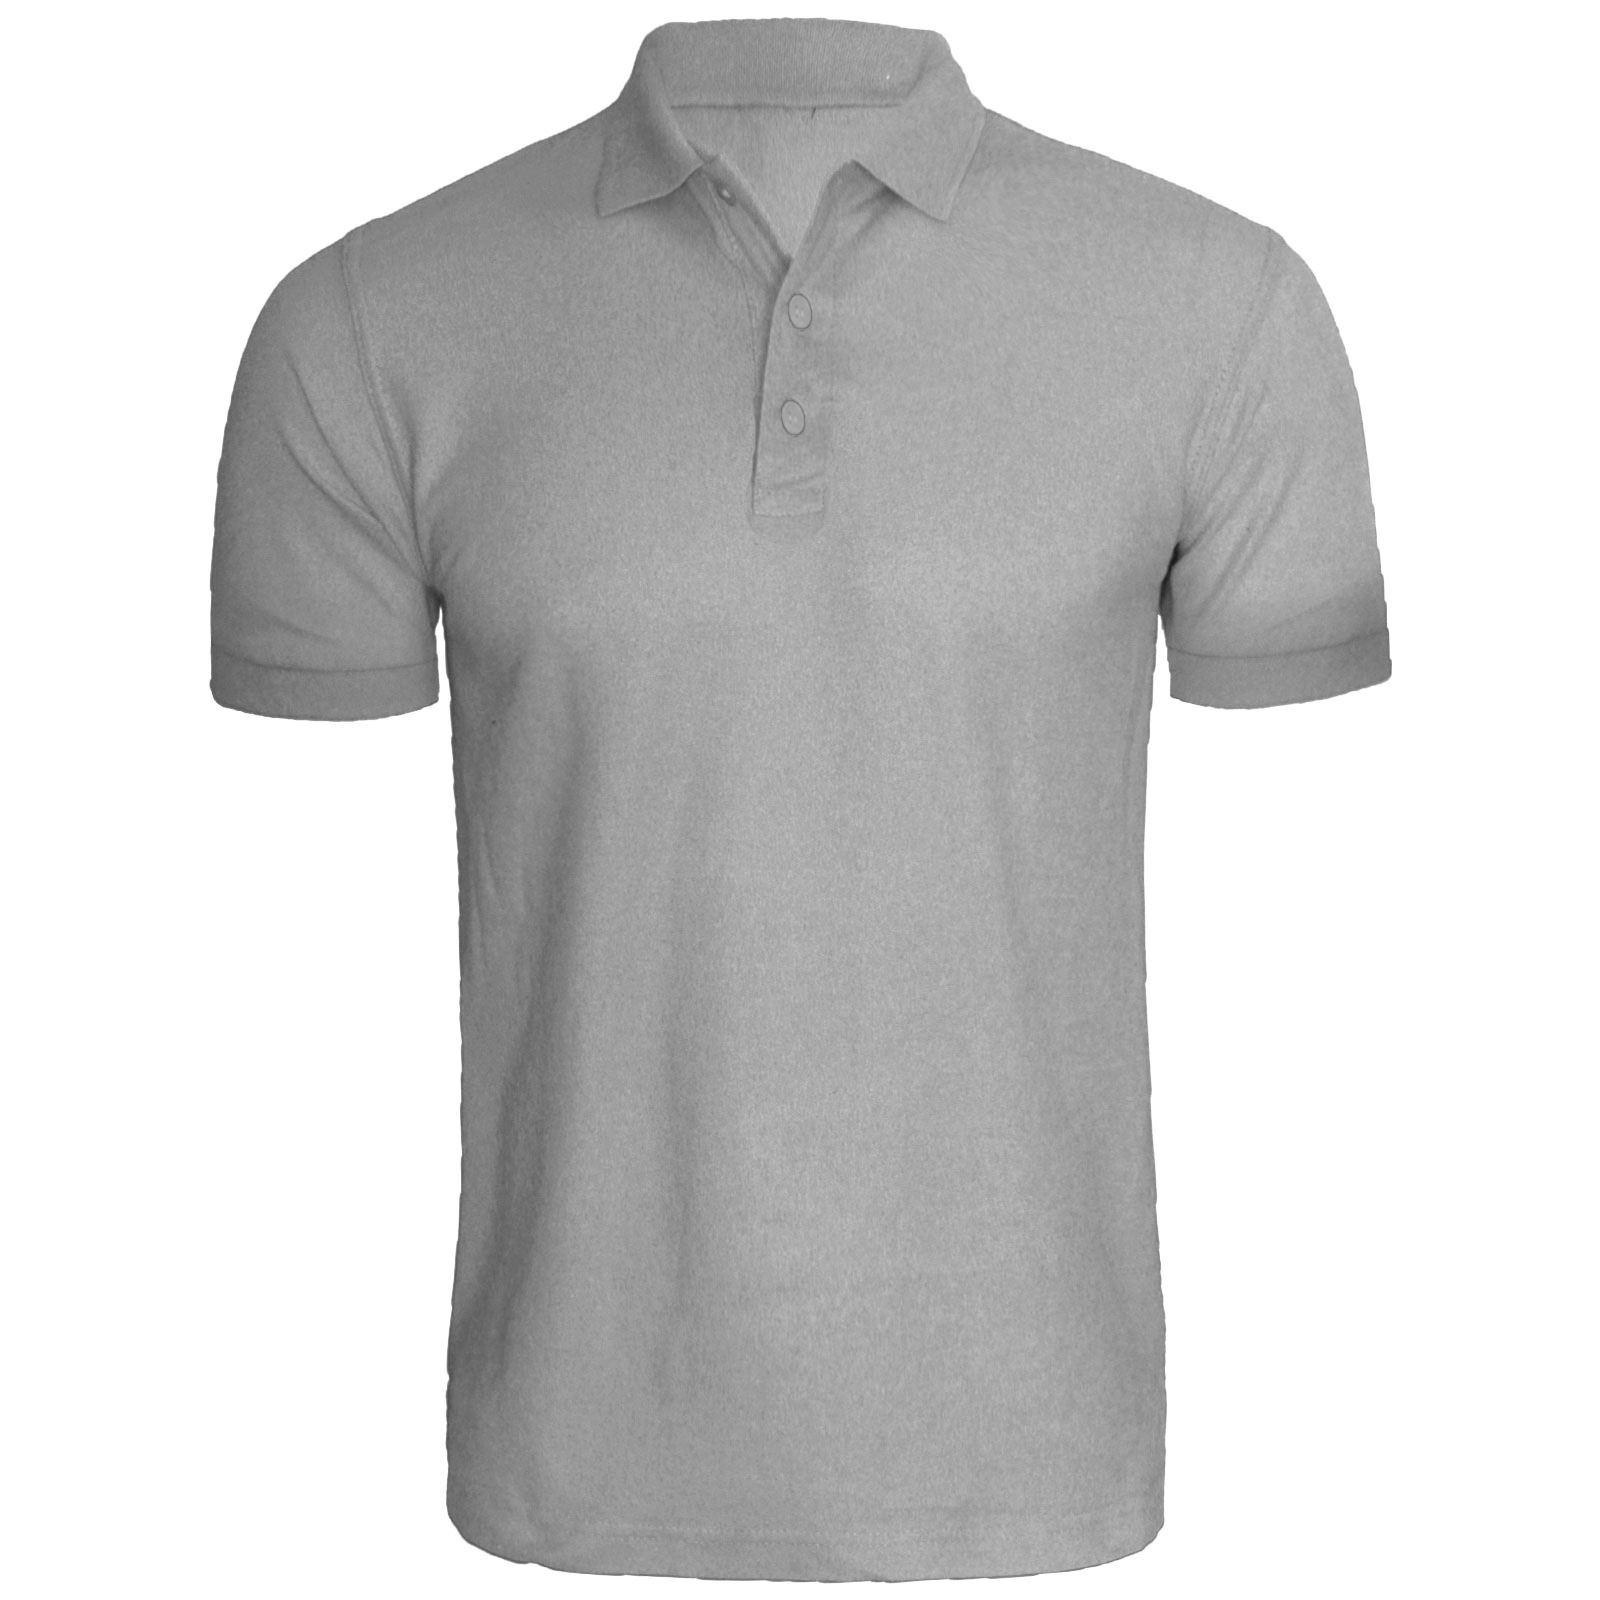 Men's Polo Shirt Mens Summer T-Shirt Short Sleeve Plain ...